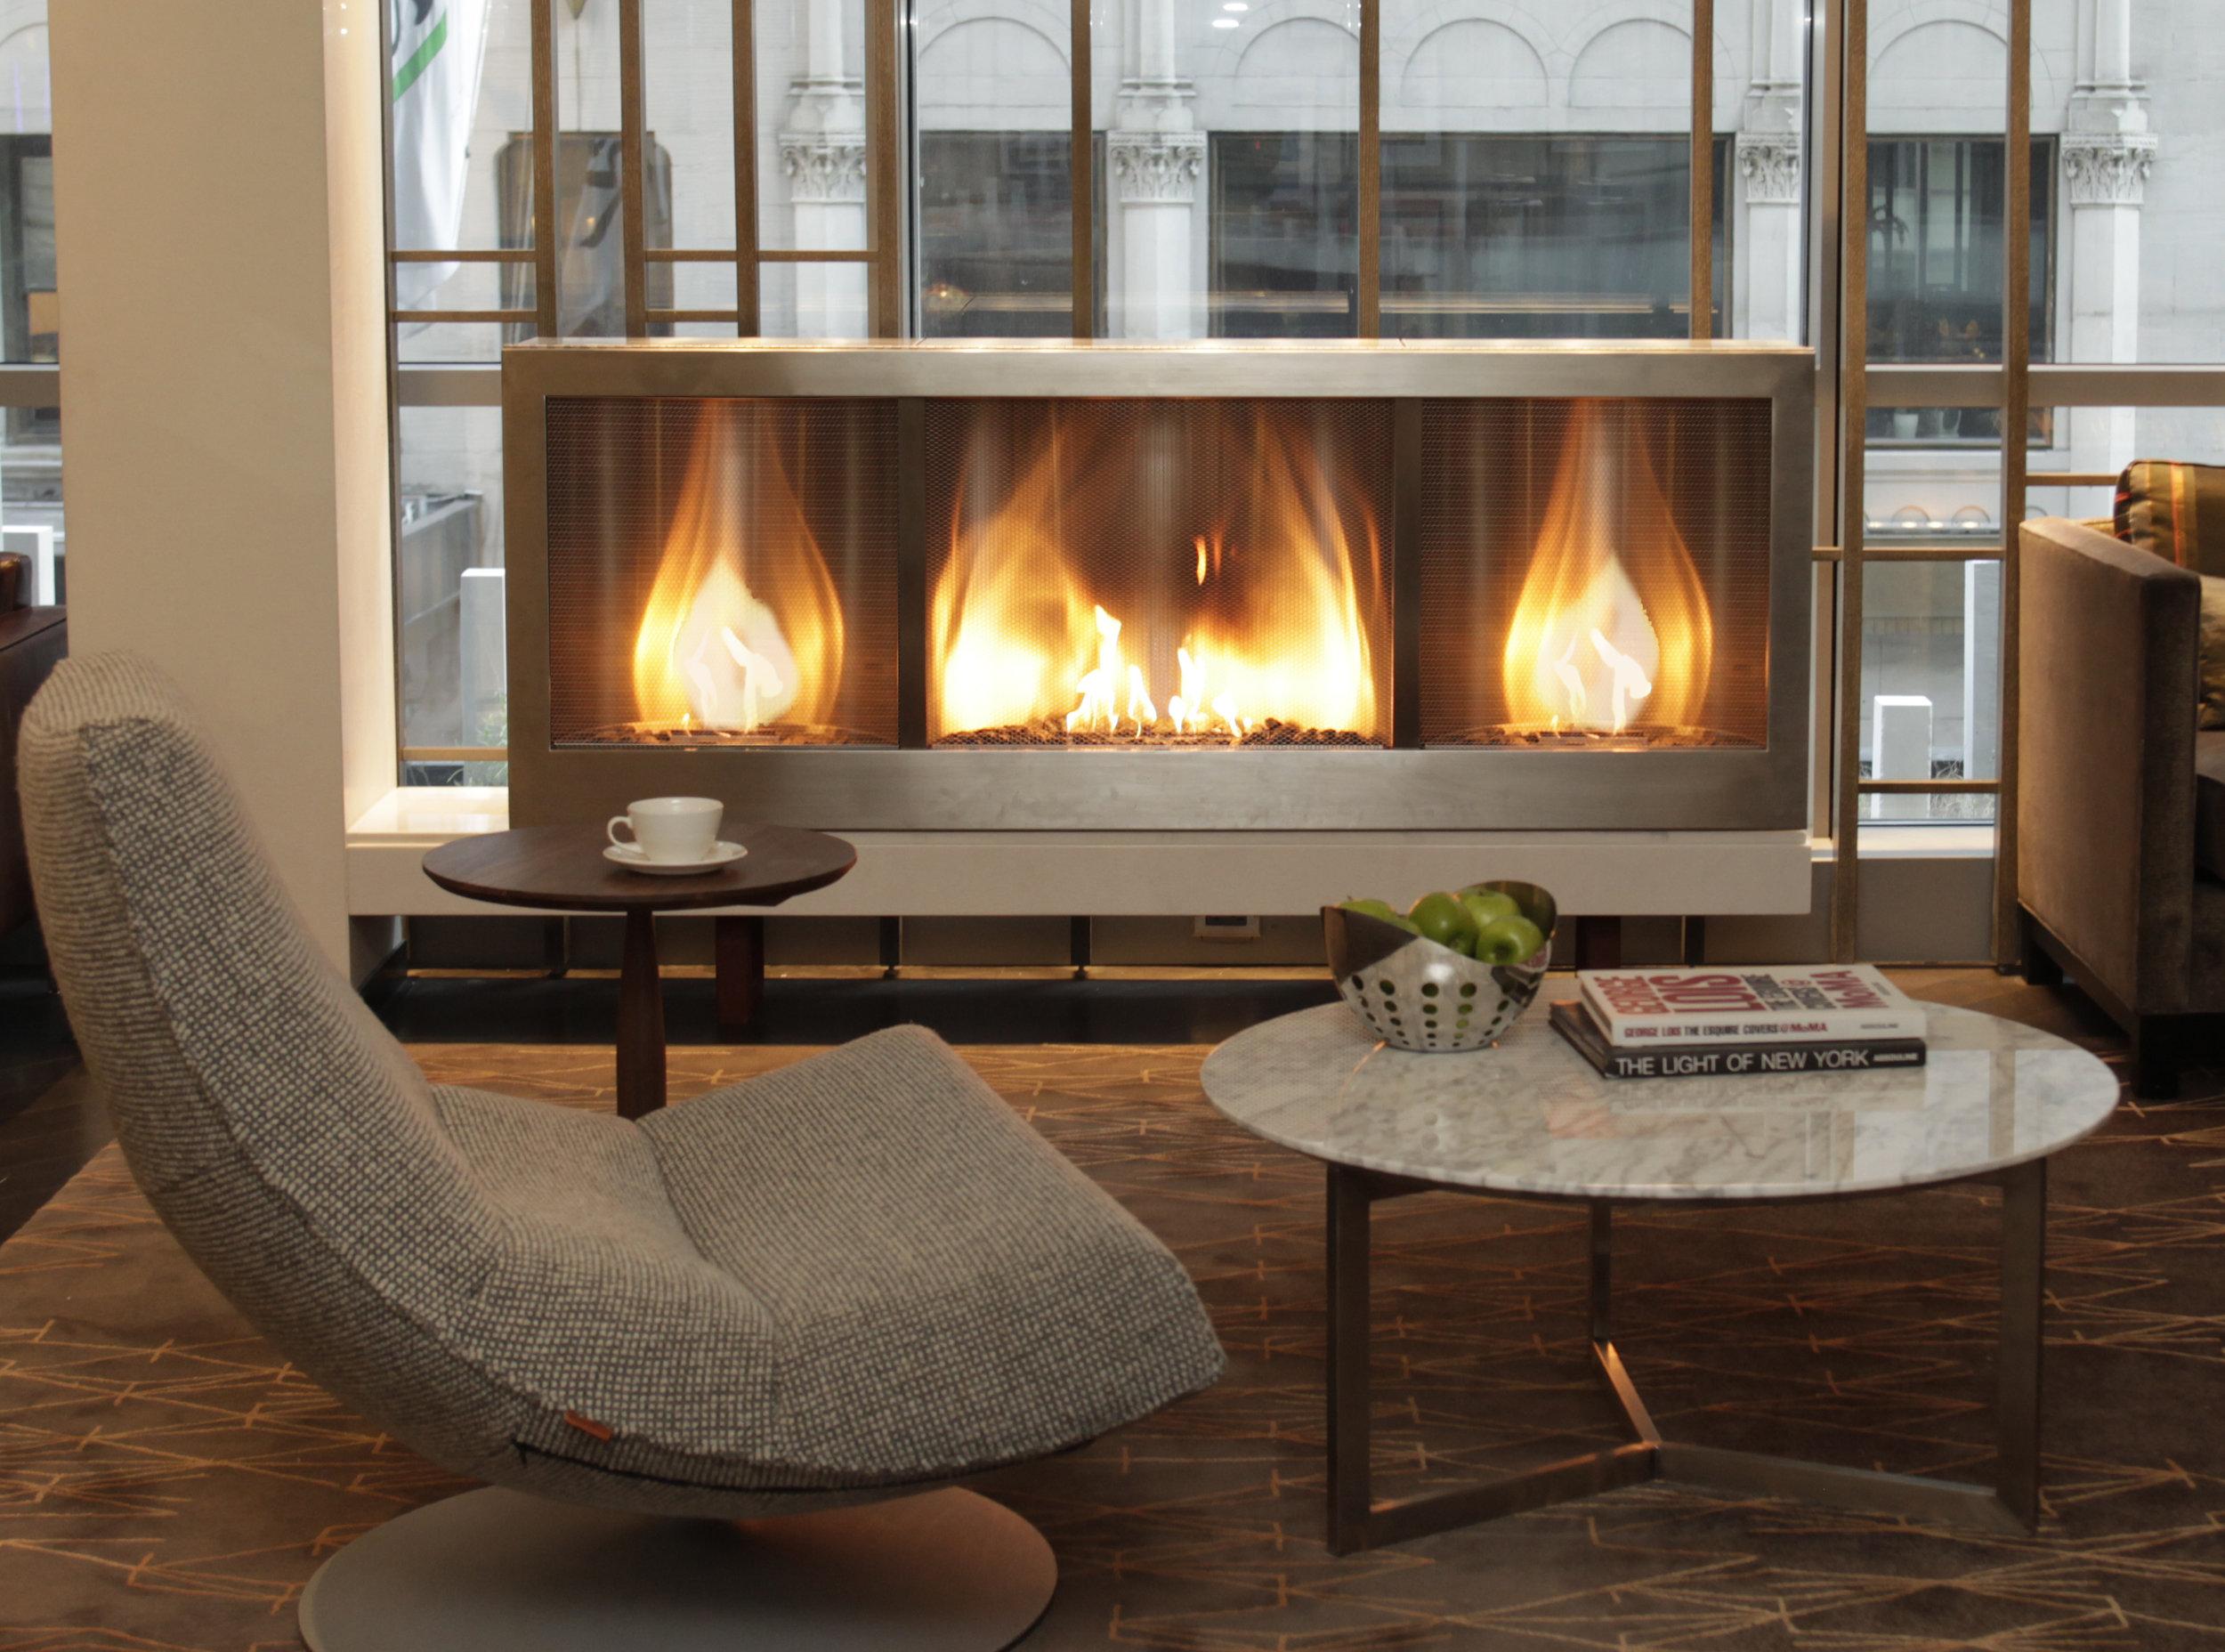 Hyatt 48 Lex New York, NY   Project by vldg